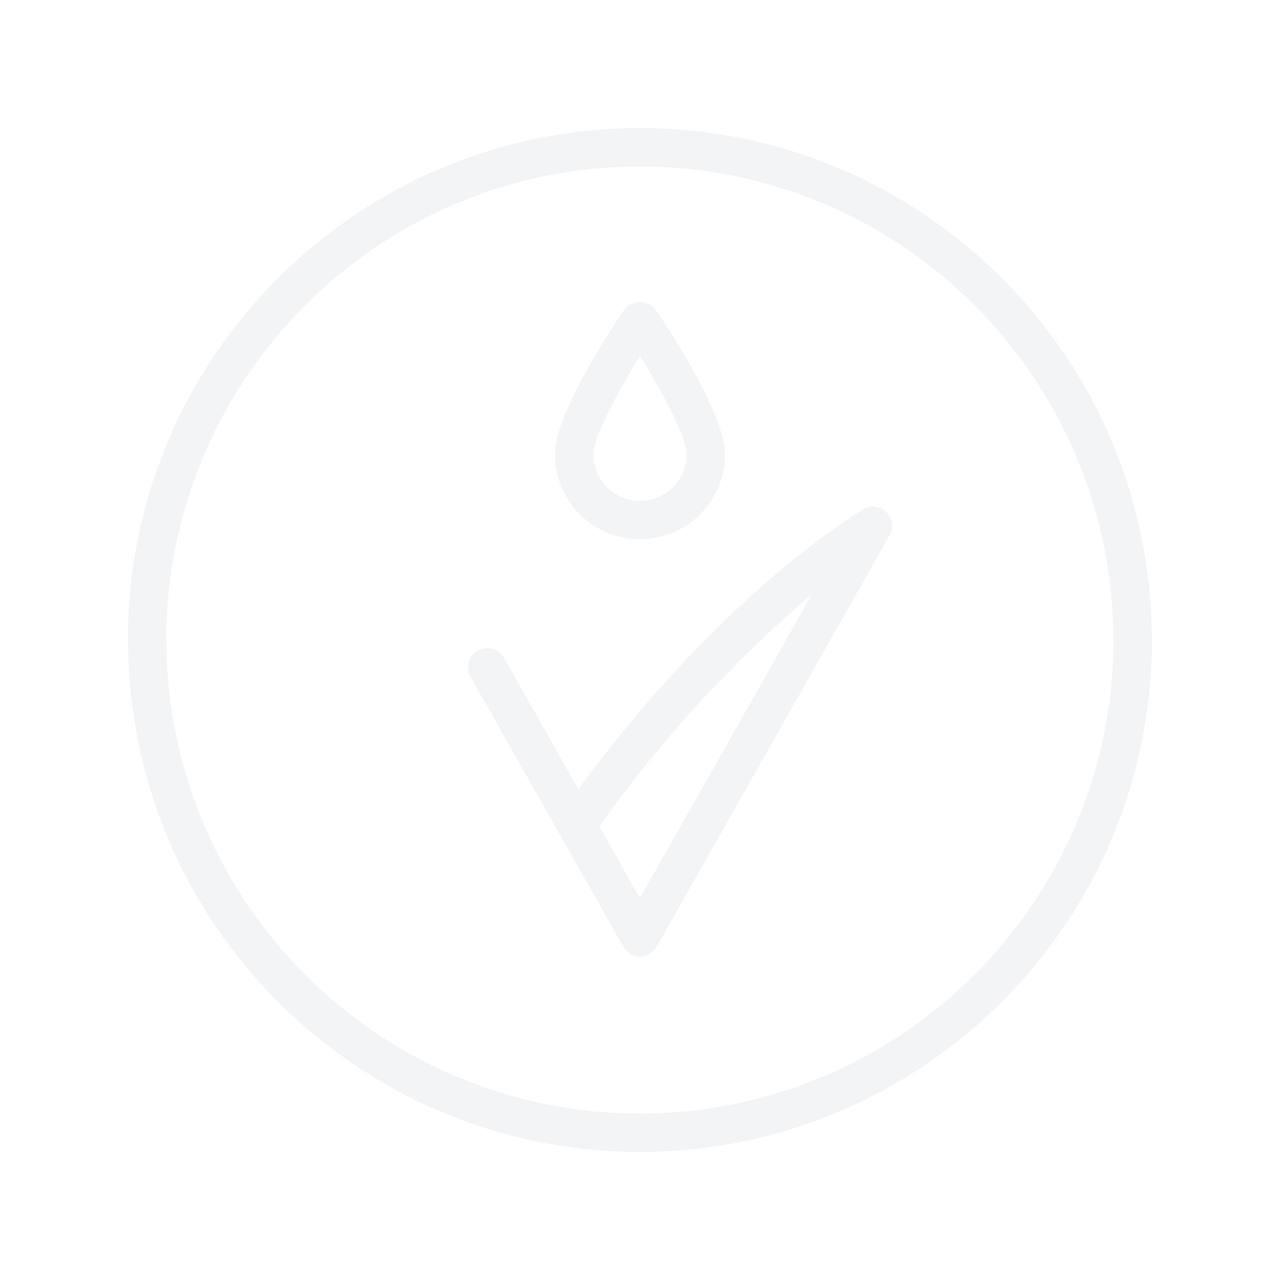 BIODERMA Photoderm Max Tinted Cream SPF50 Golden Colour 40ml